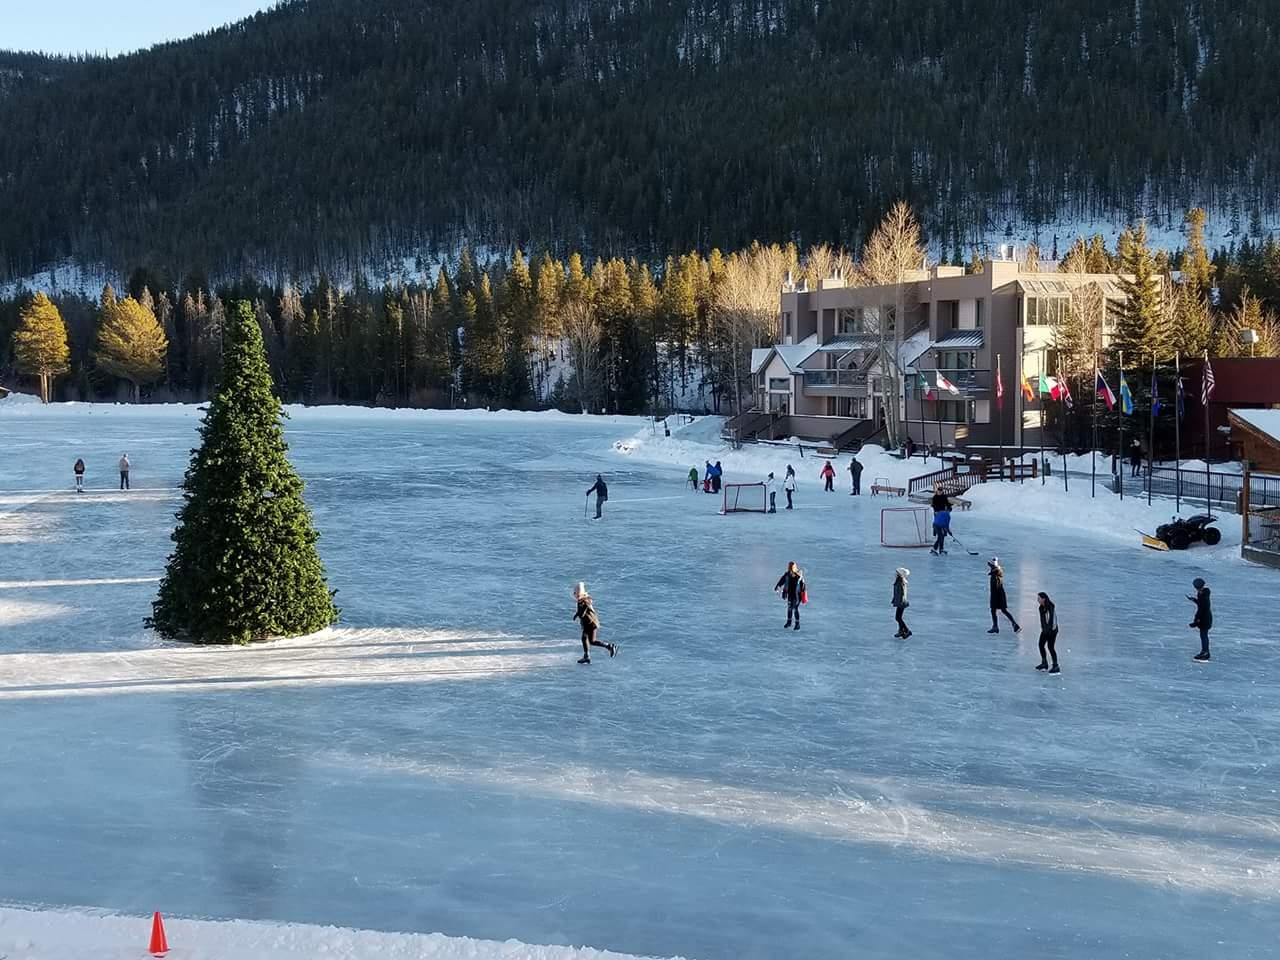 SummitCove-Keystone-Colorado-Outdoor-Ice-Skating